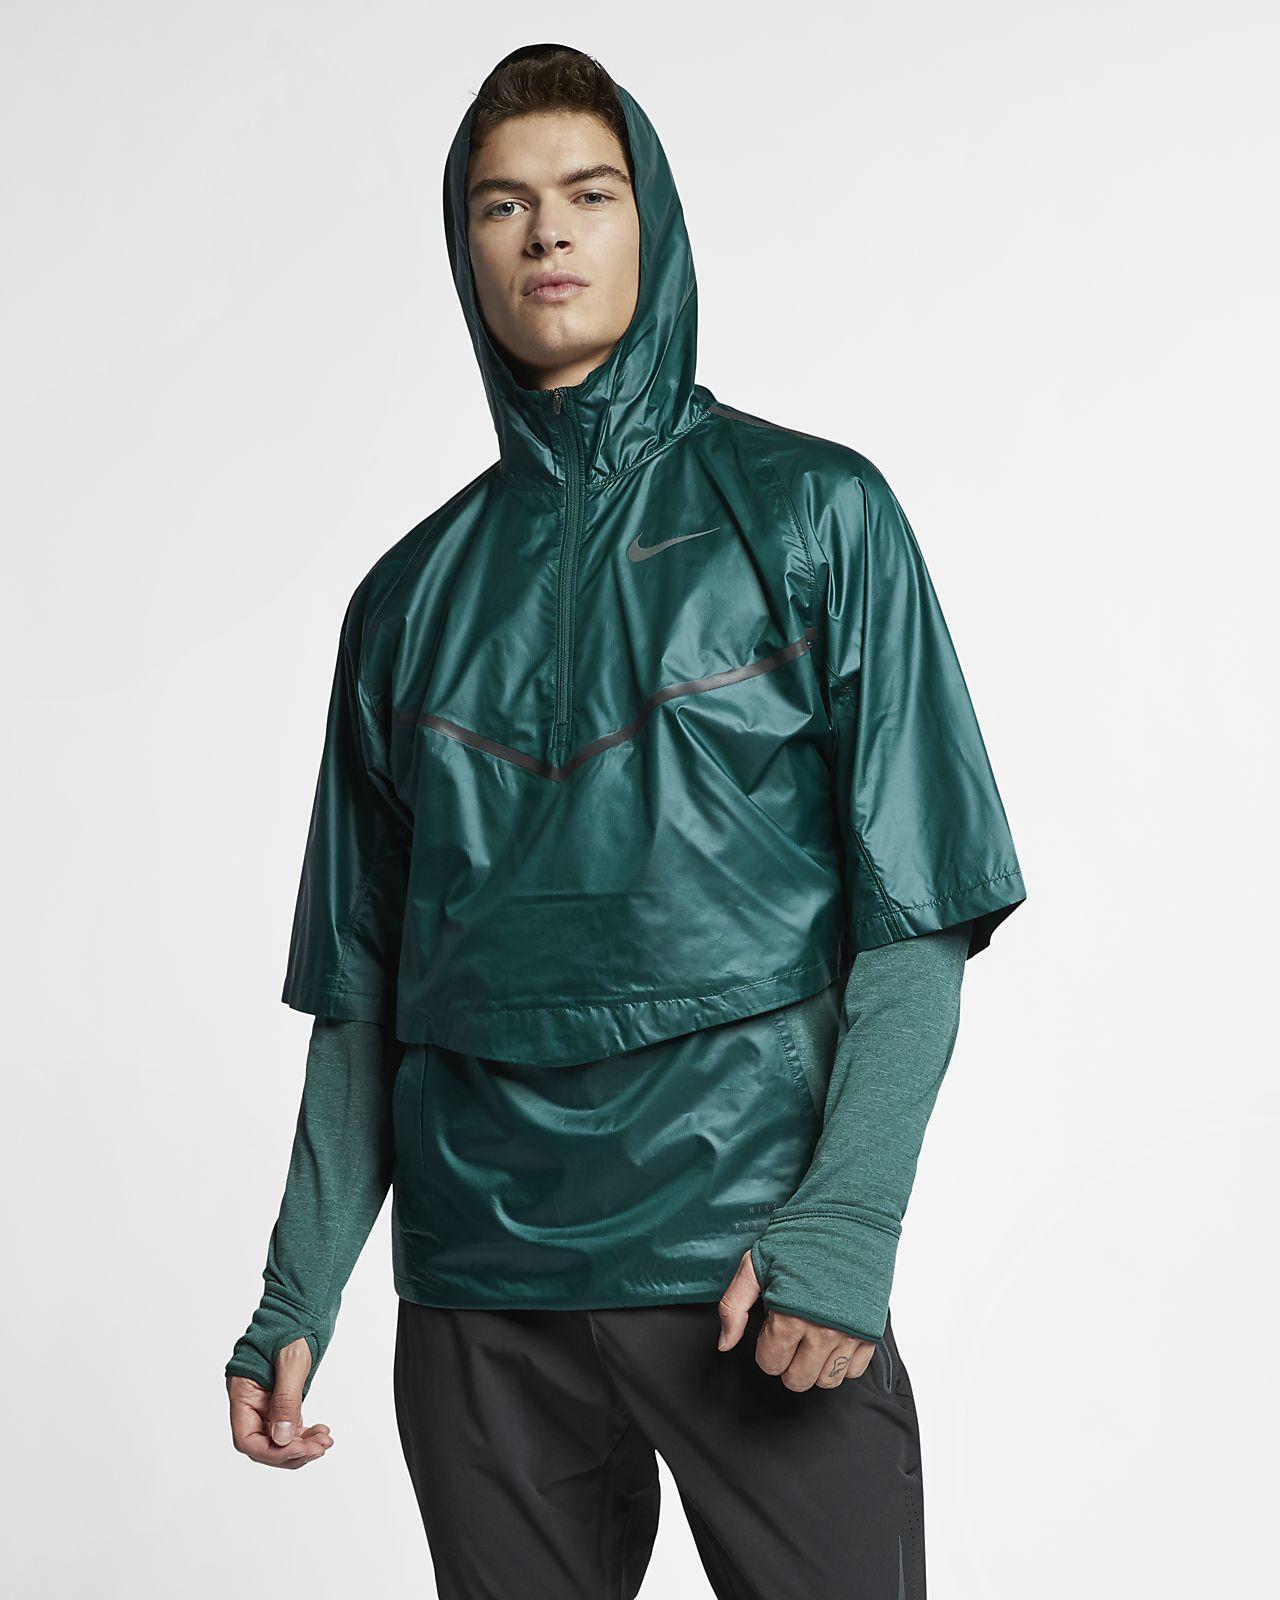 Nike Sphere Men's Transform Running Top